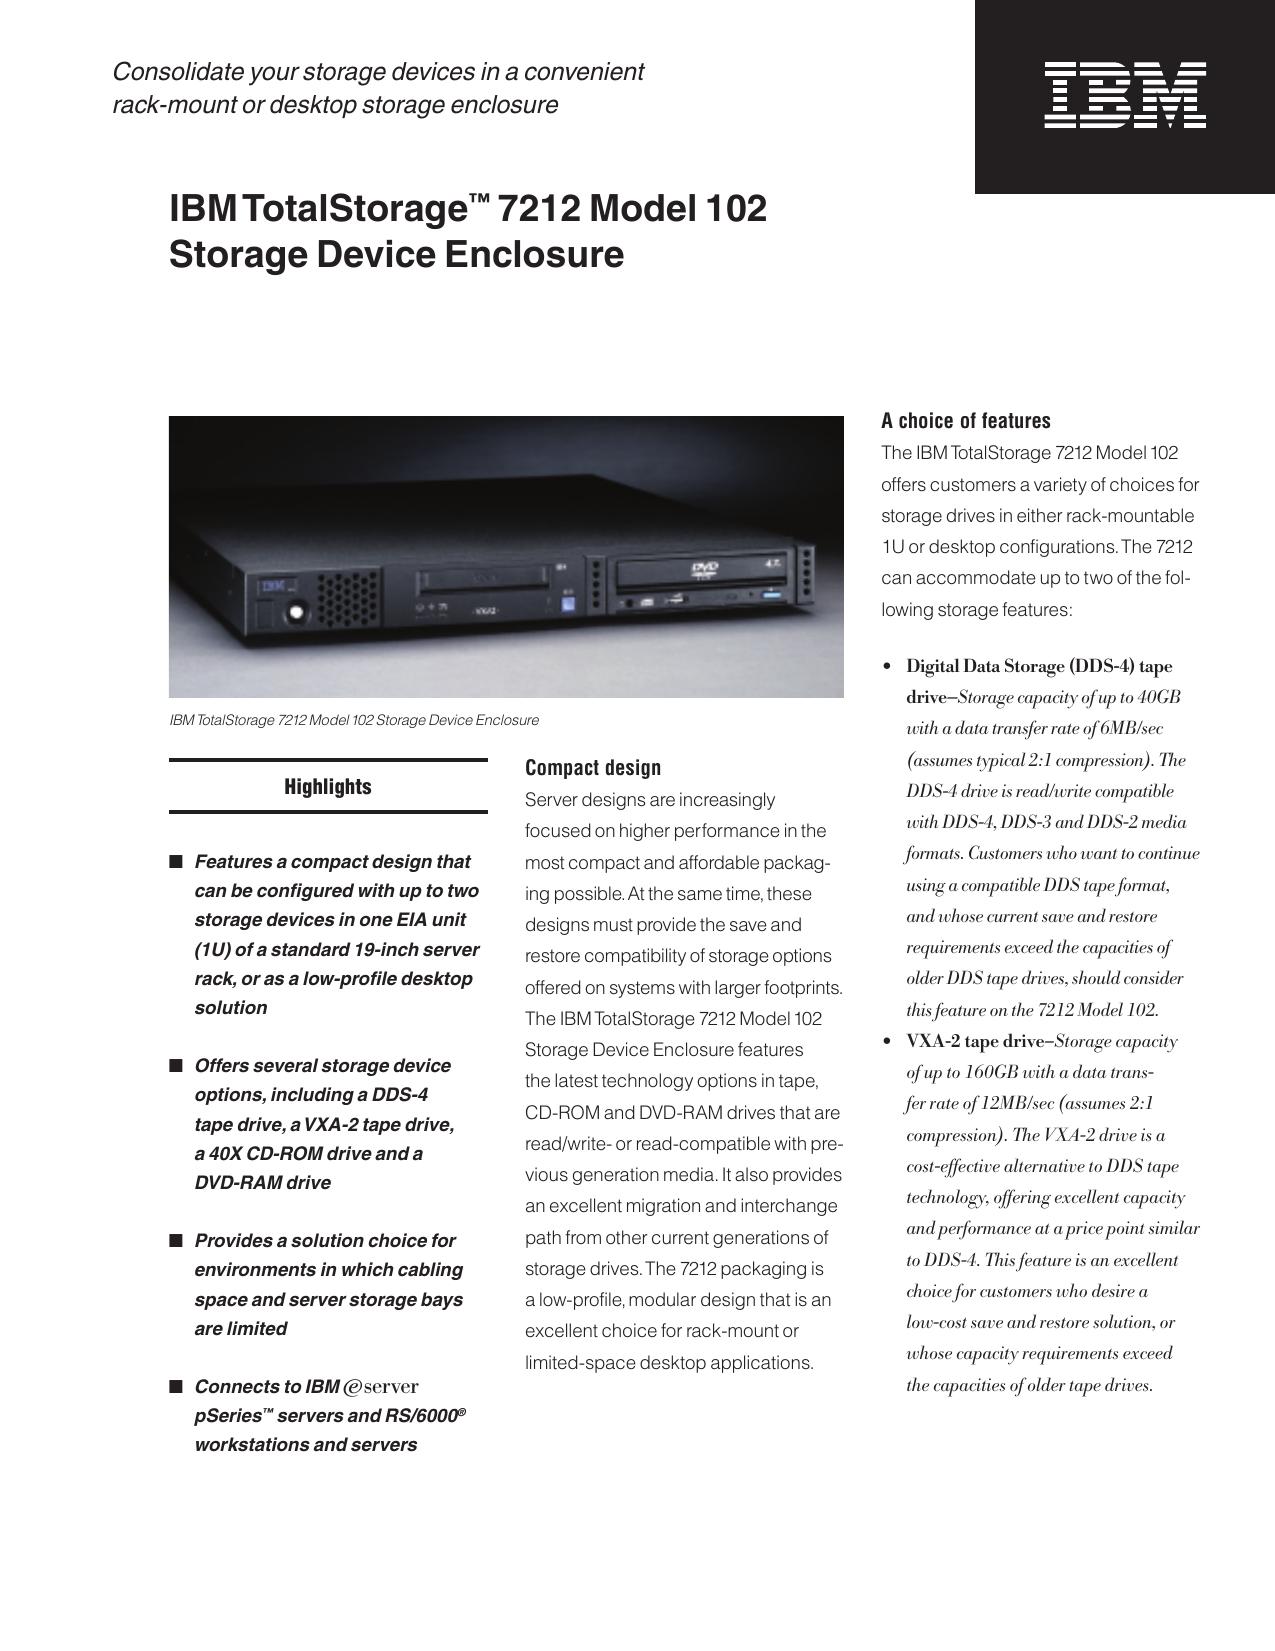 IBM TotalStorage™ 7212 Model 102 Storage Device Enclosure